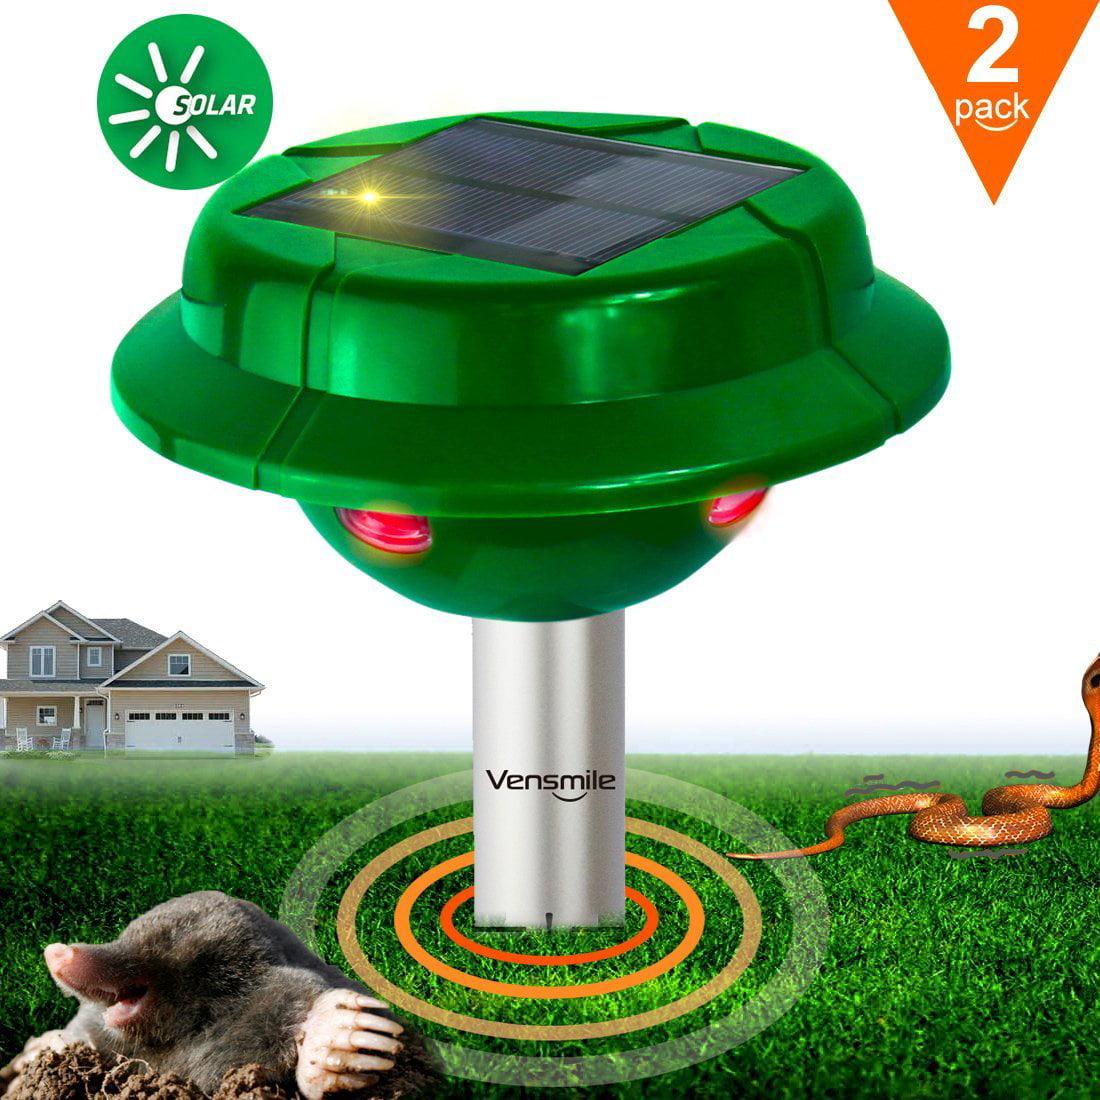 2 x Vensmile Solar Snake Repellent Mole Repeller Control ...